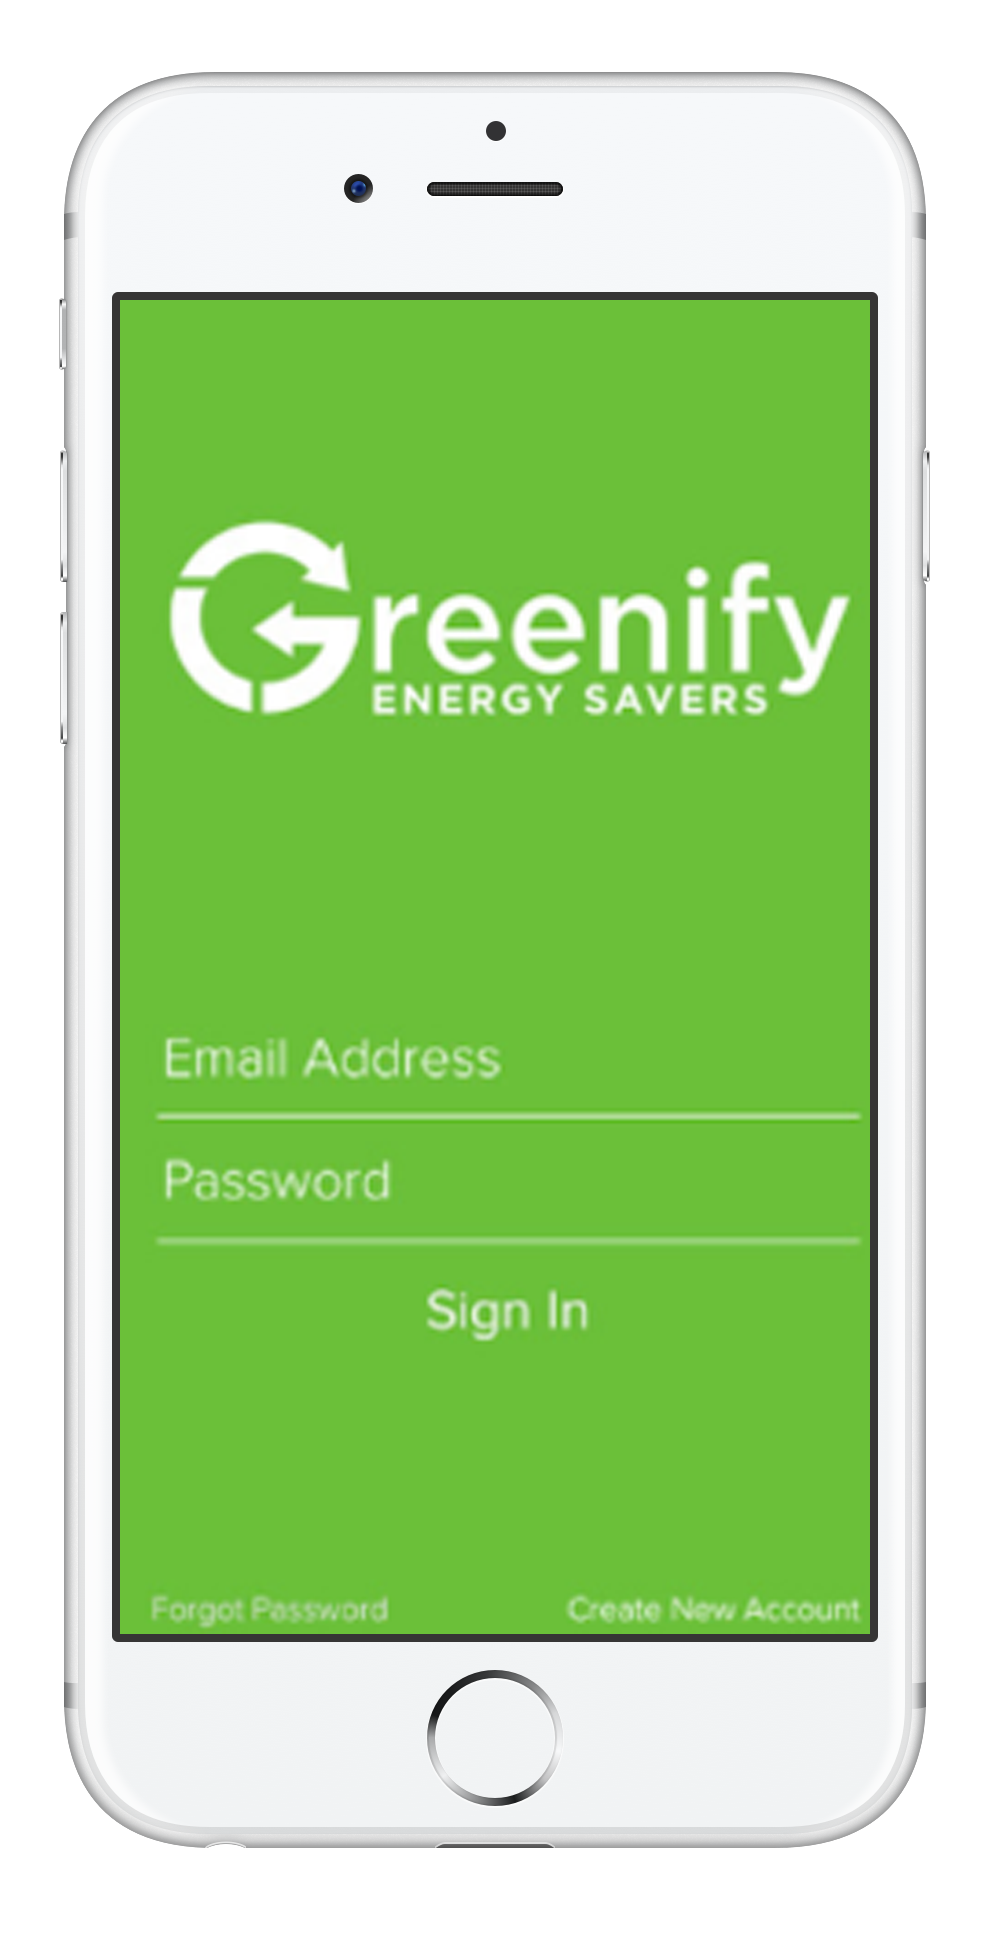 greenify.png